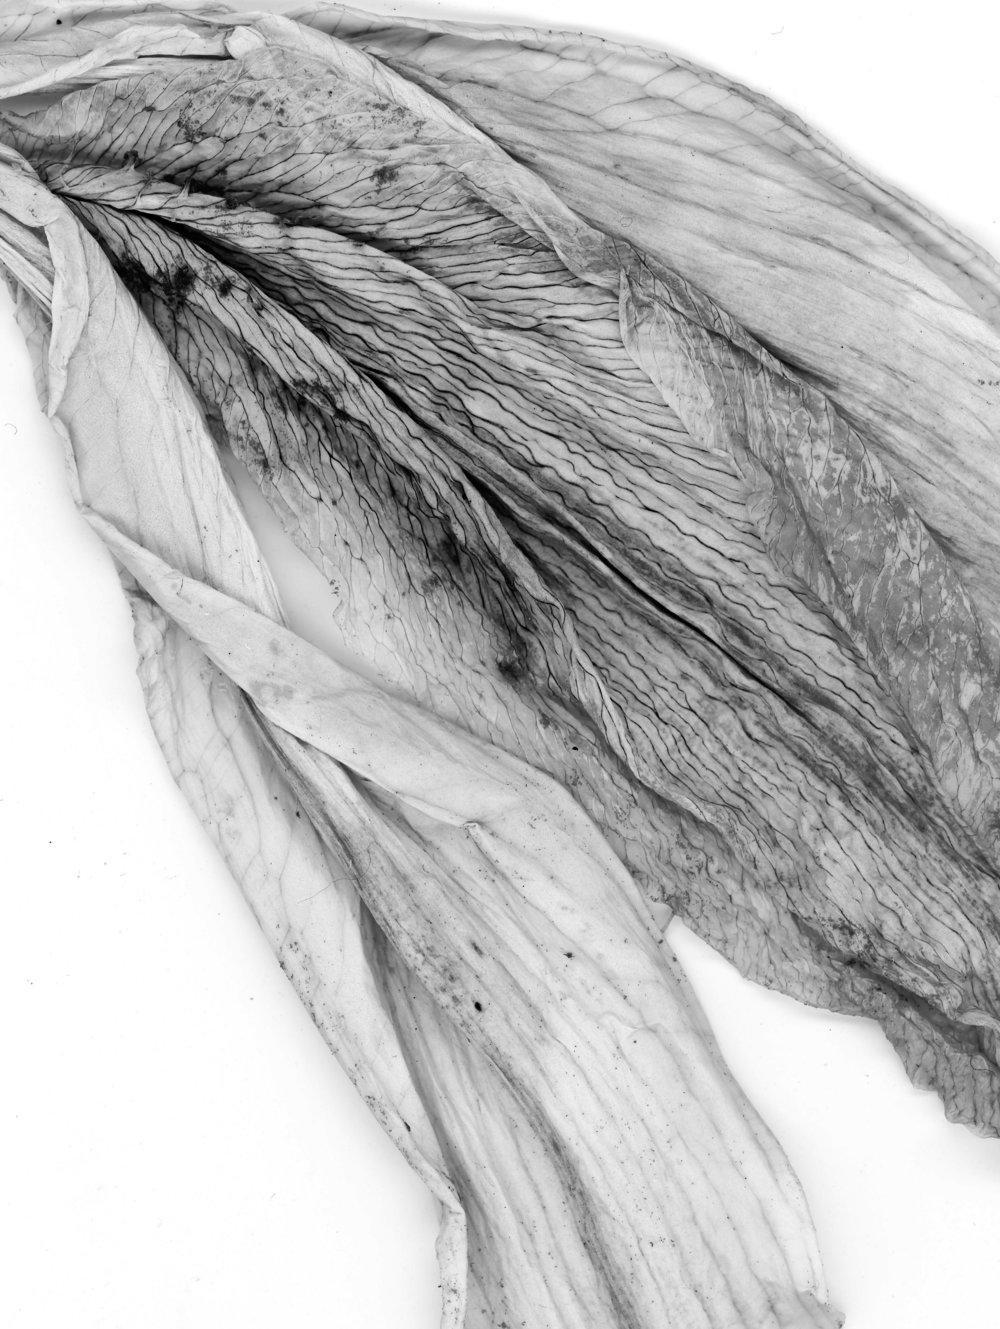 Dried Petal